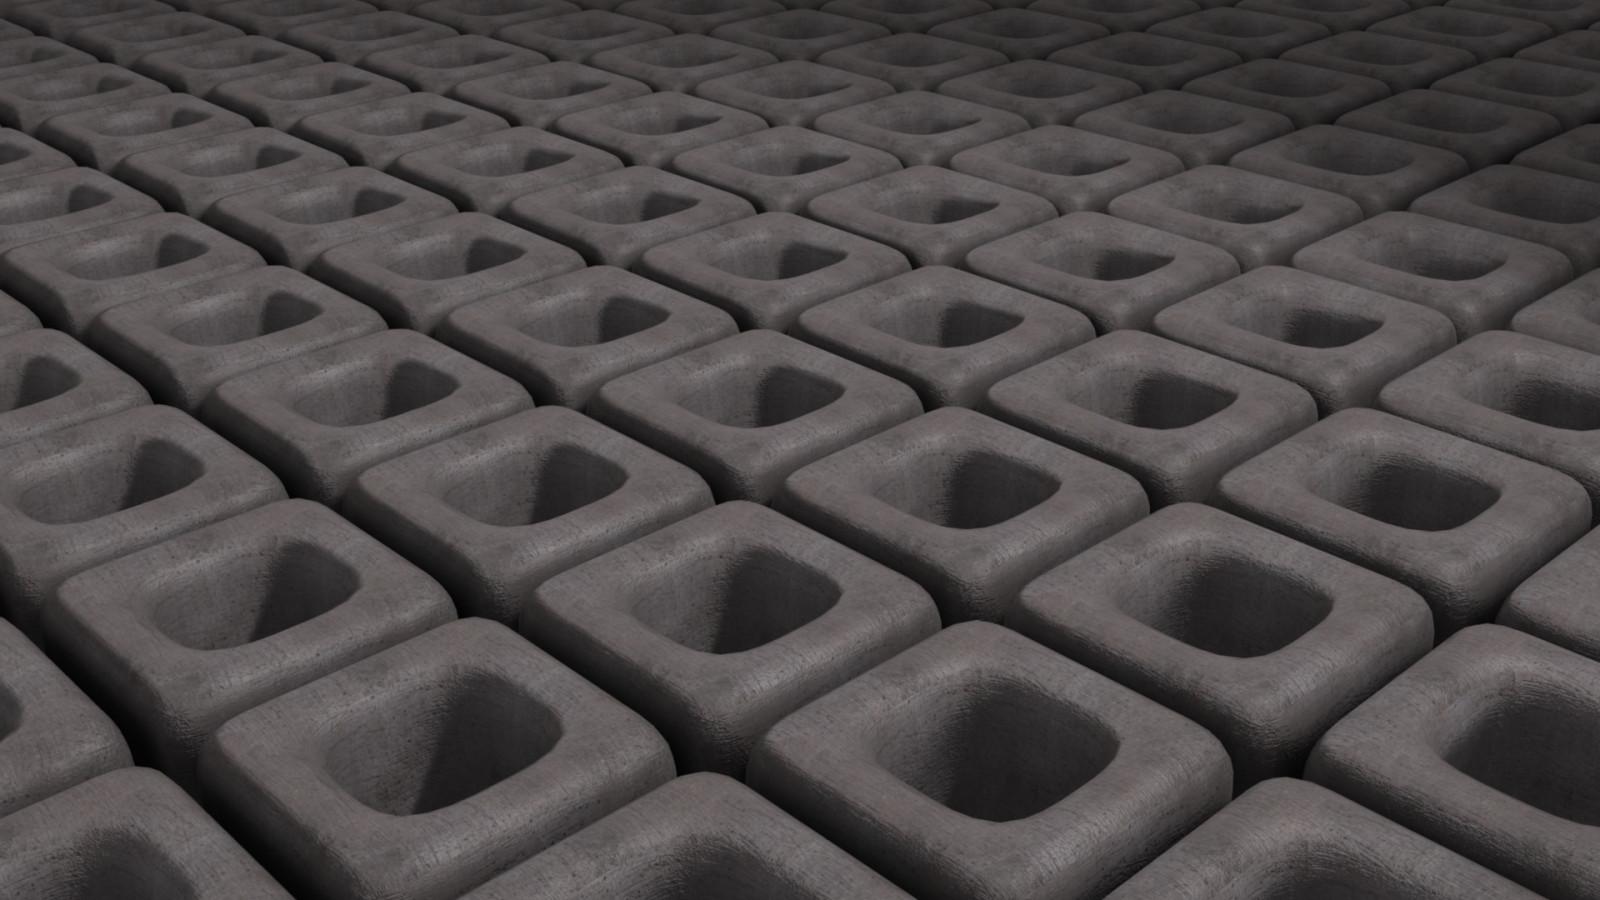 Wallpaper digital art monochrome abstract 3d minimalism cobblestone cube pattern - Tire tread wallpaper ...